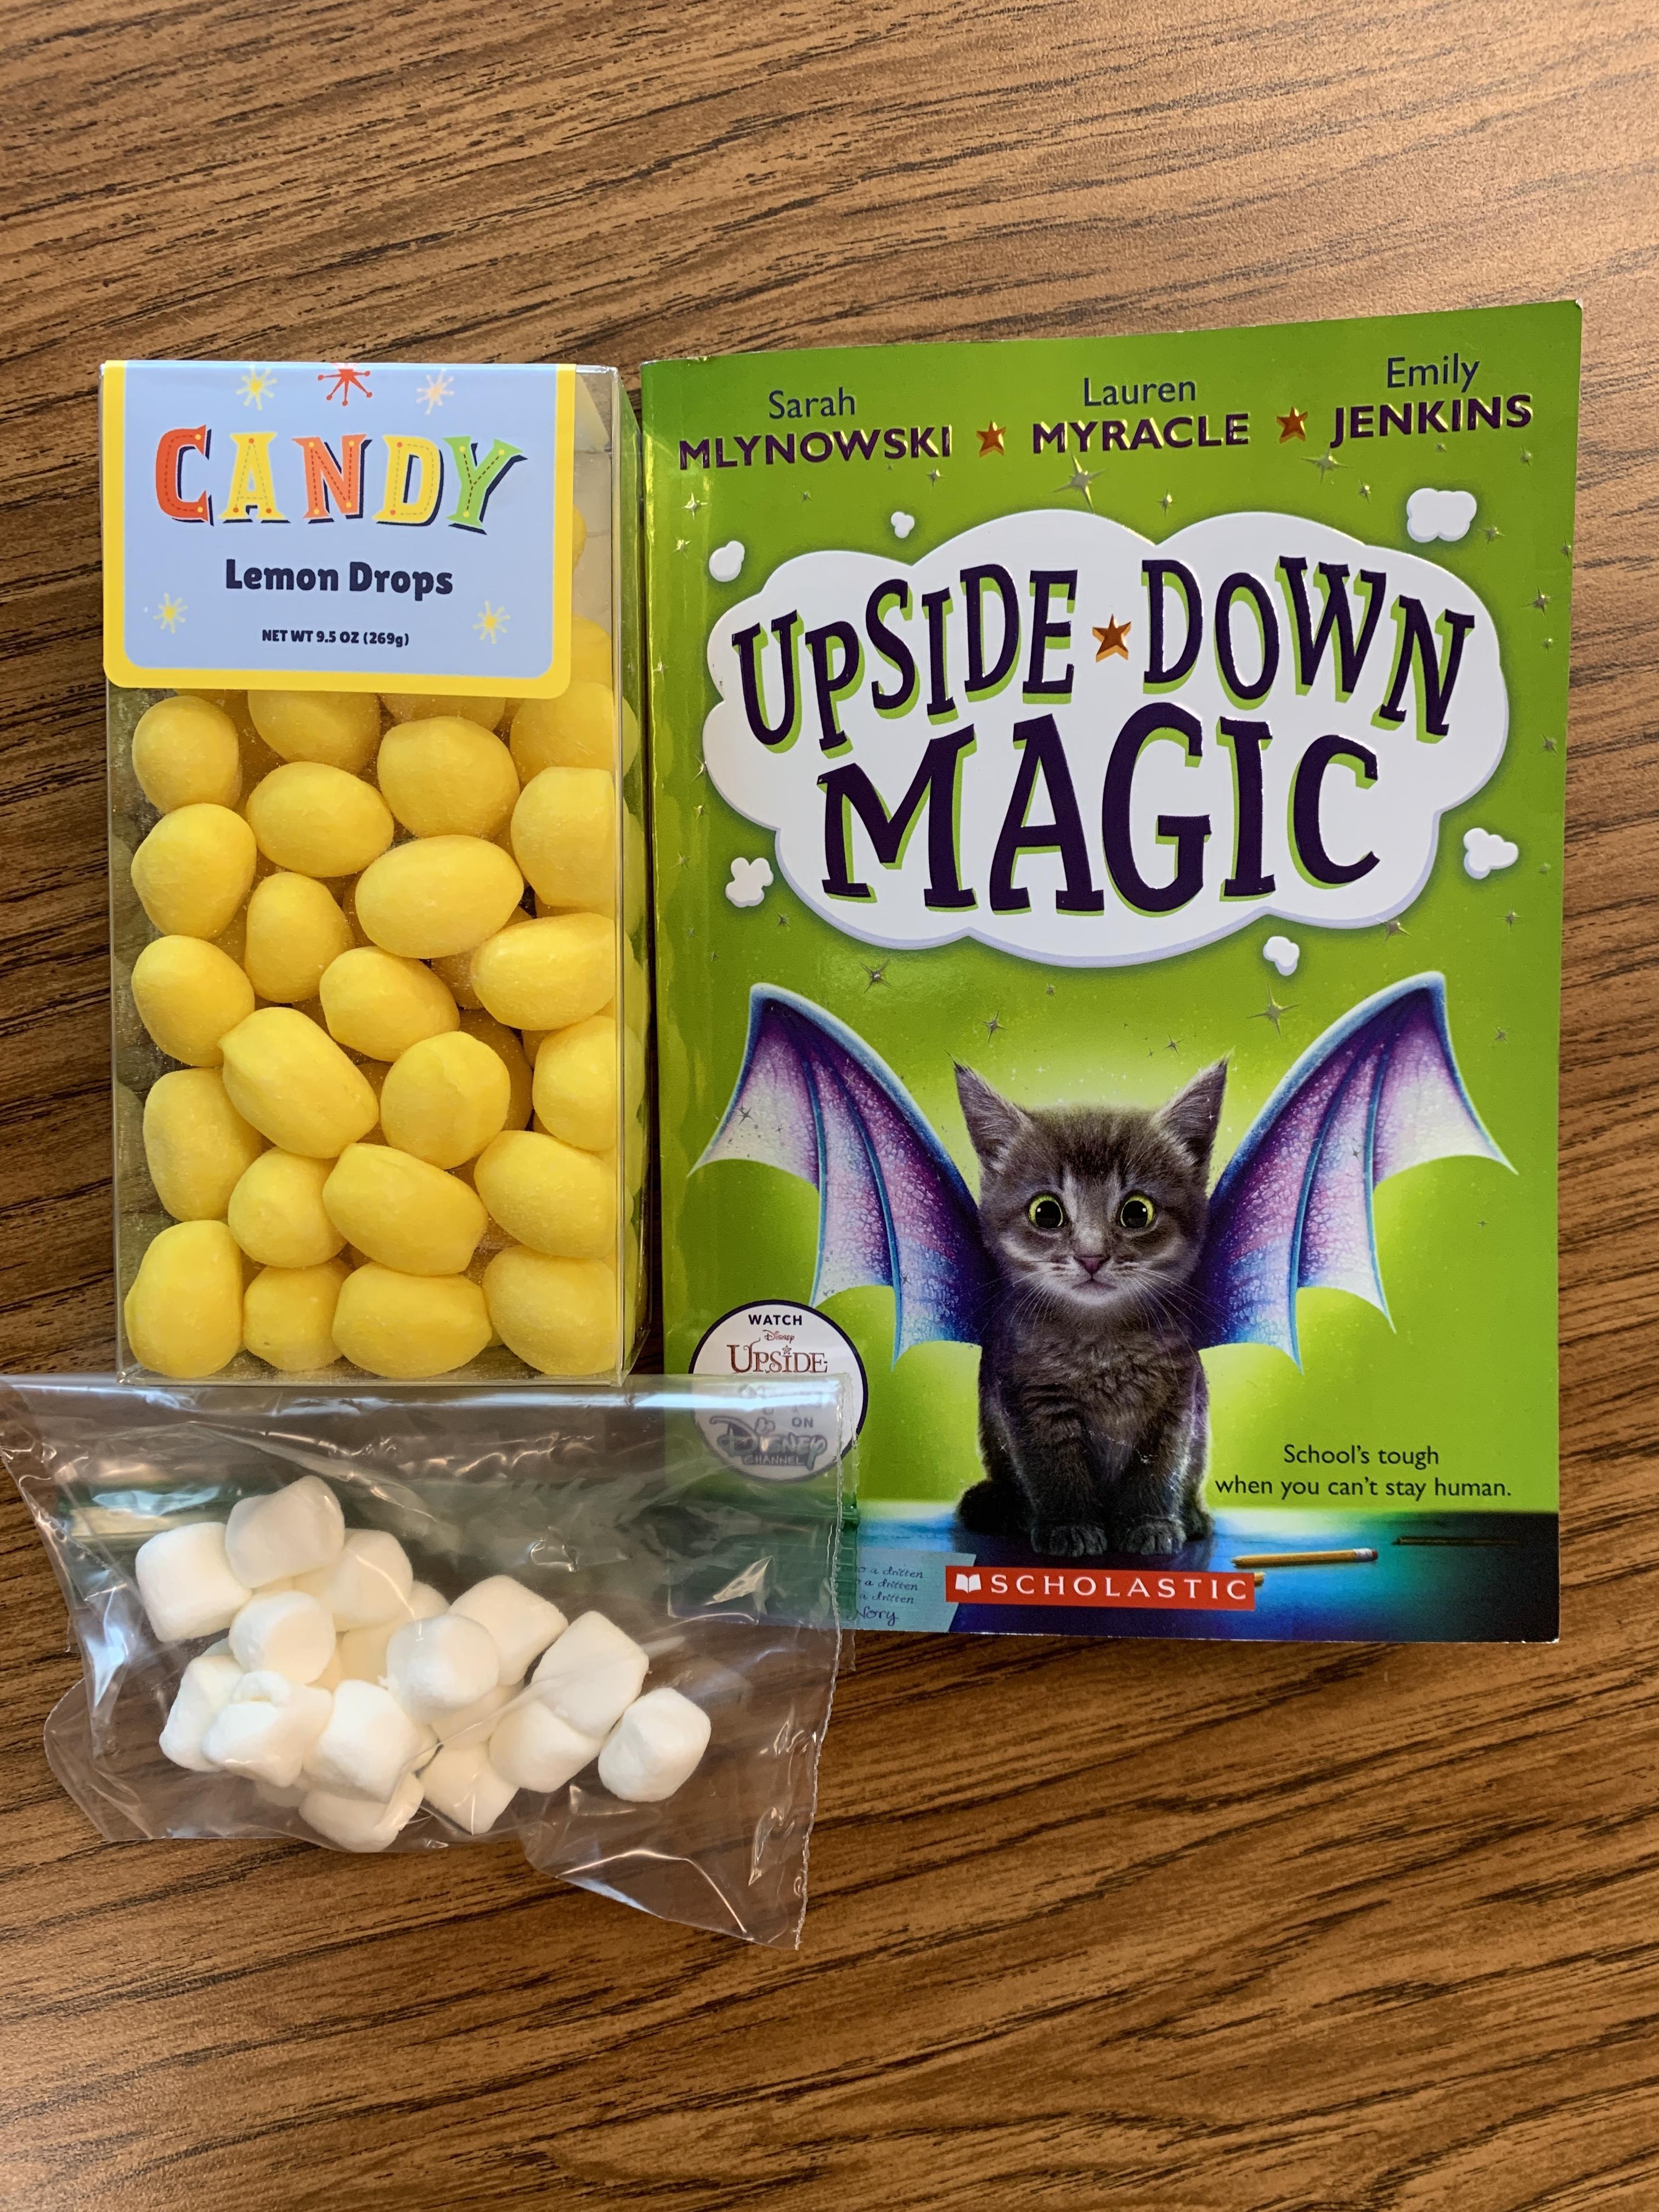 Upside-Down Magic Treats